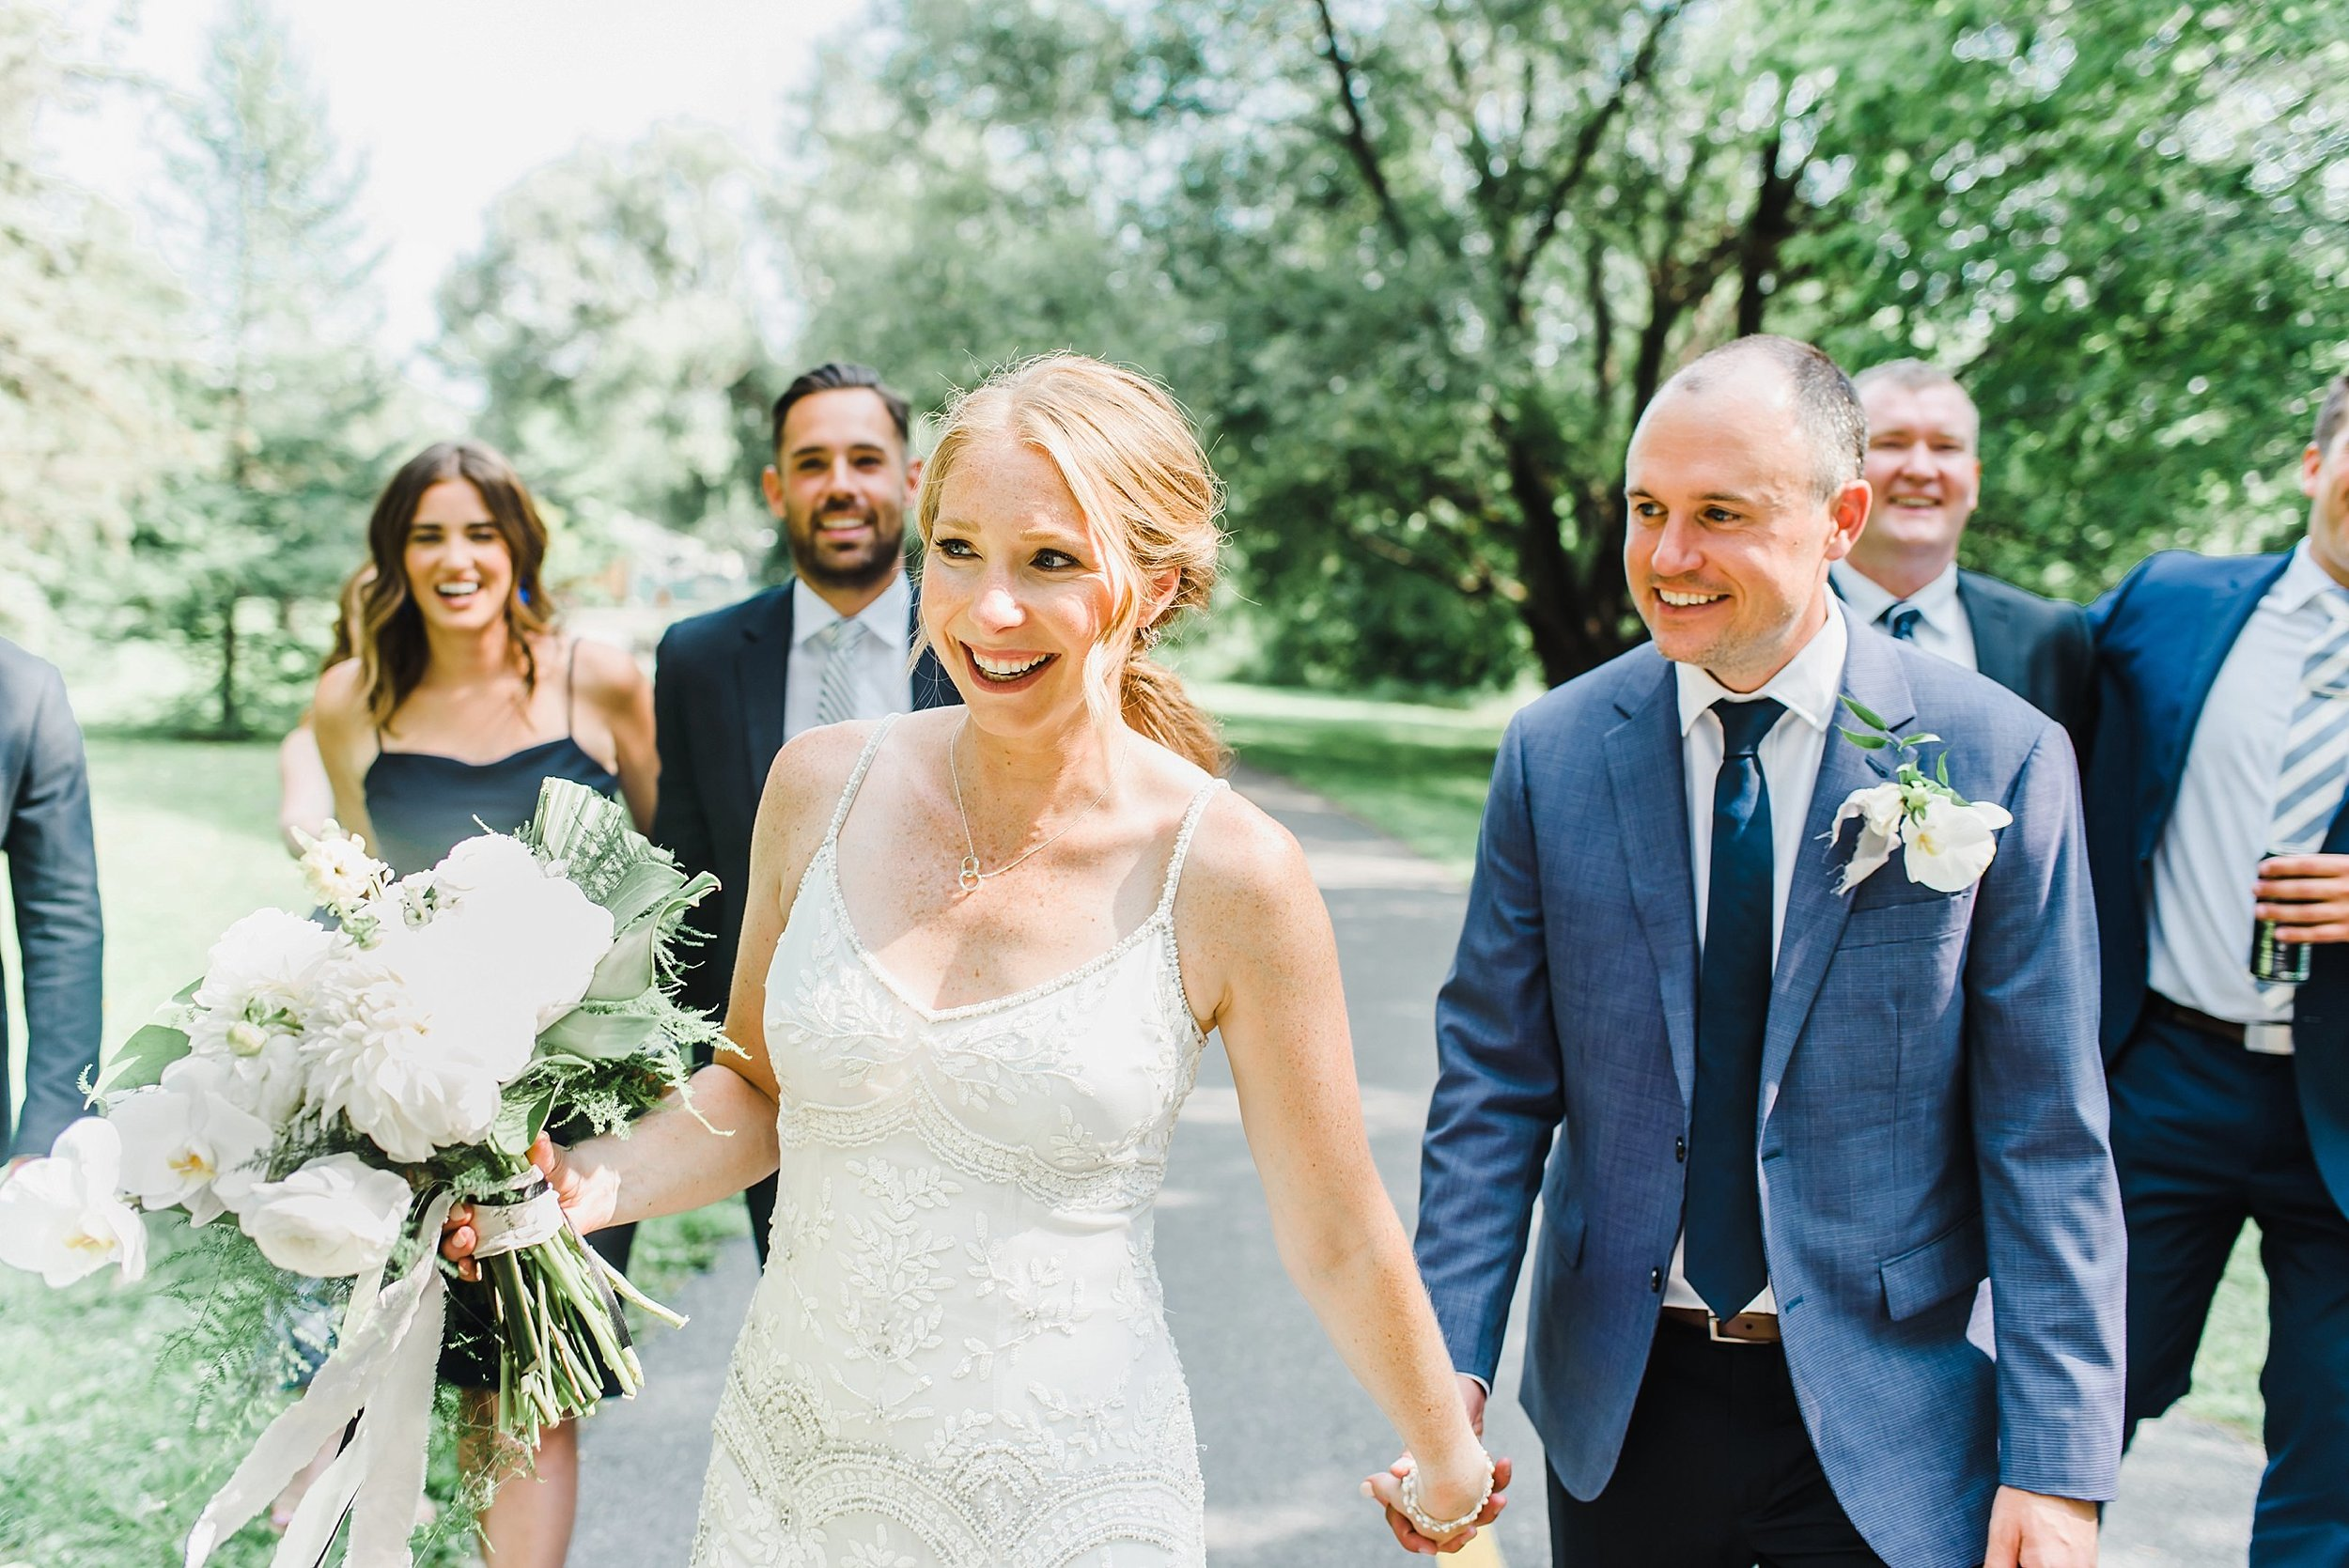 light airy indie fine art ottawa wedding photographer | Ali and Batoul Photography_0670.jpg